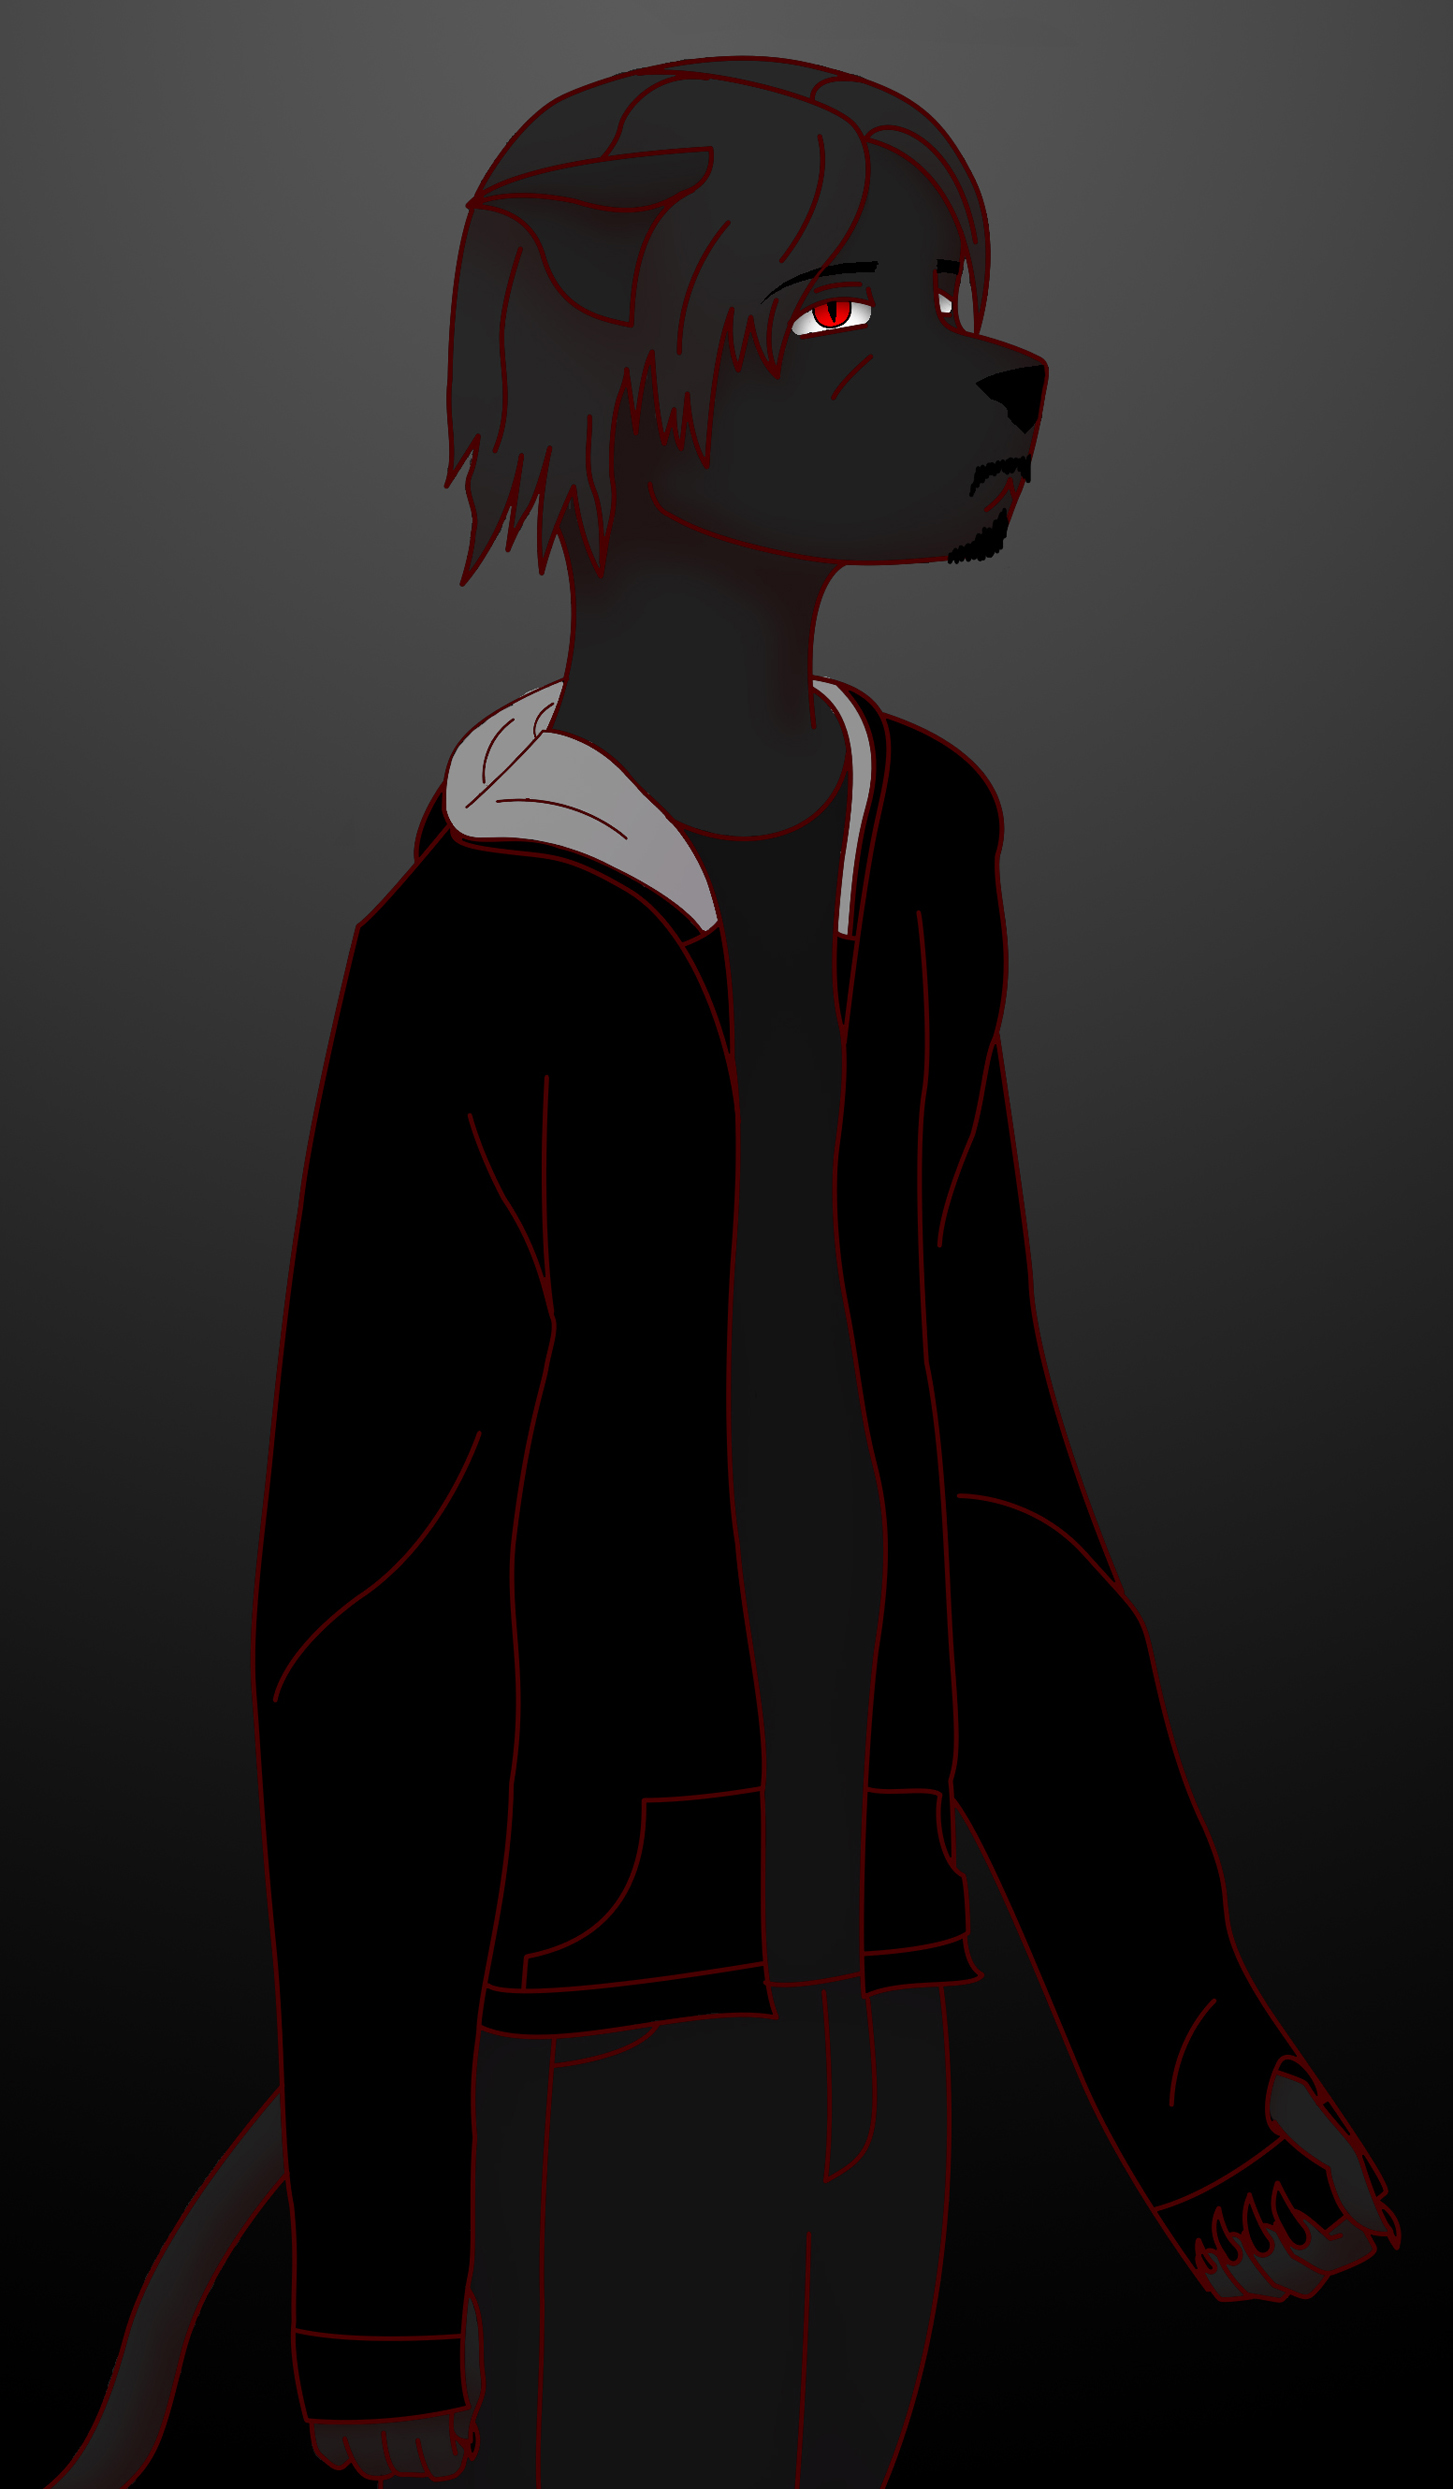 Grim Redrawn